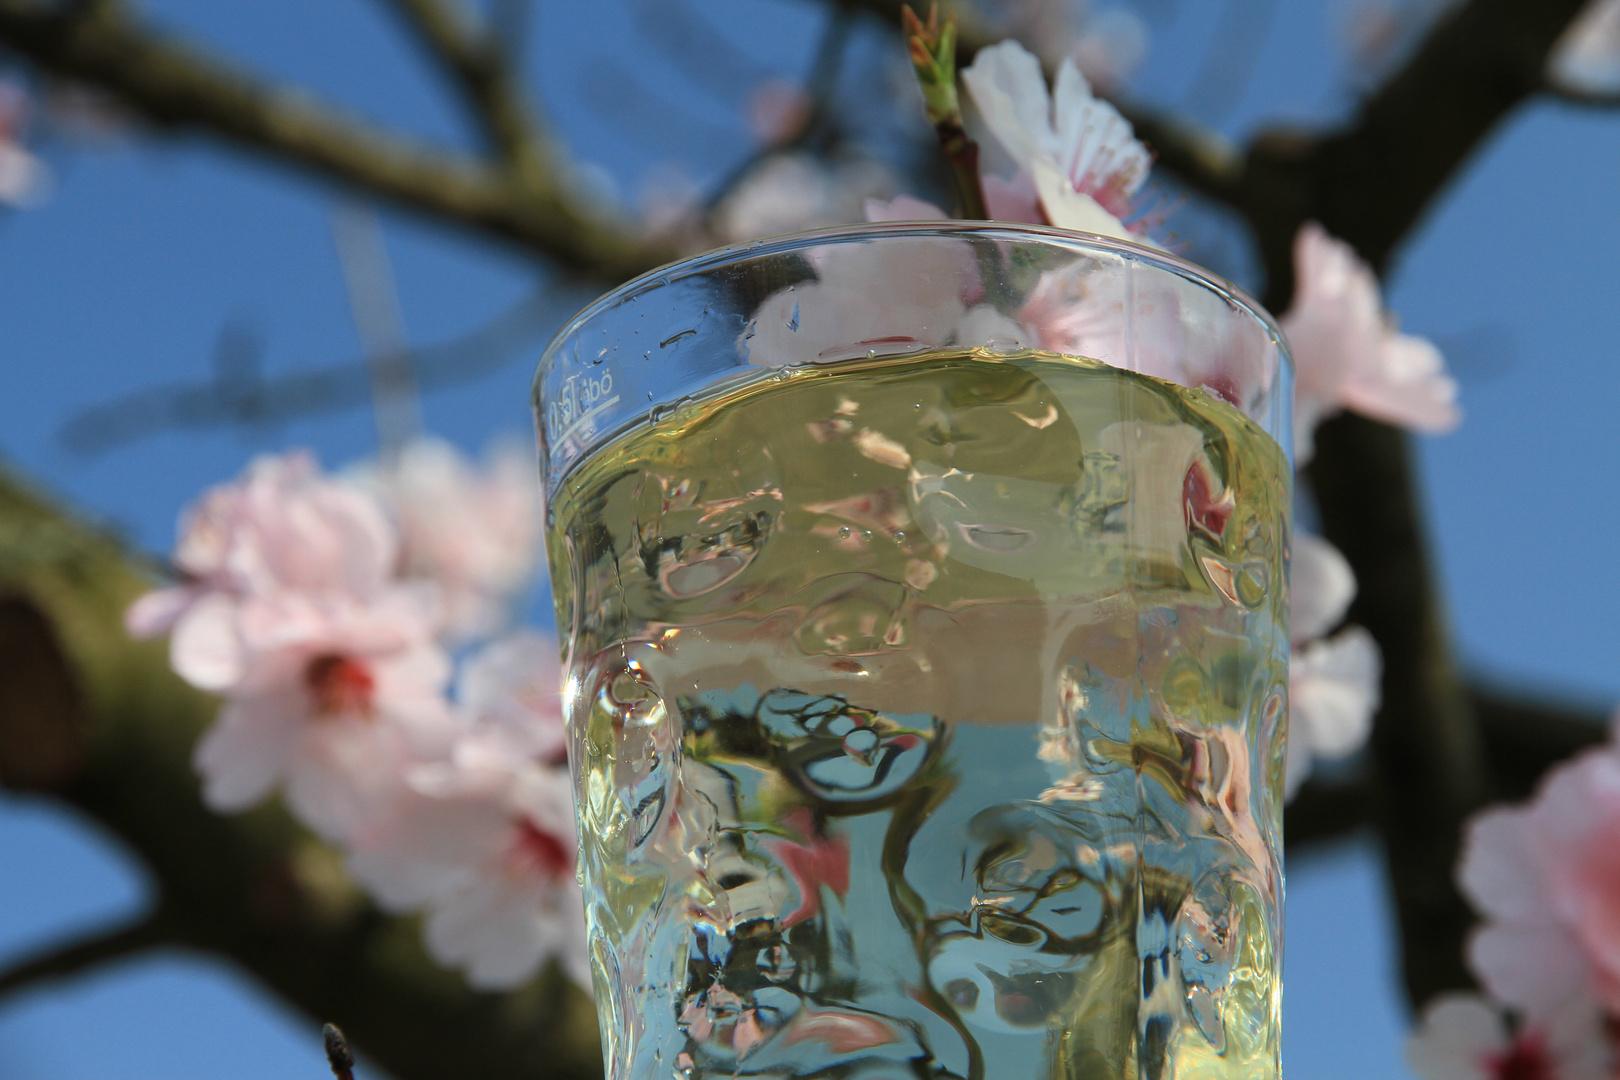 Rieslingschorle im Dubbeglas zur Mandelblüte in Gimmeldingen